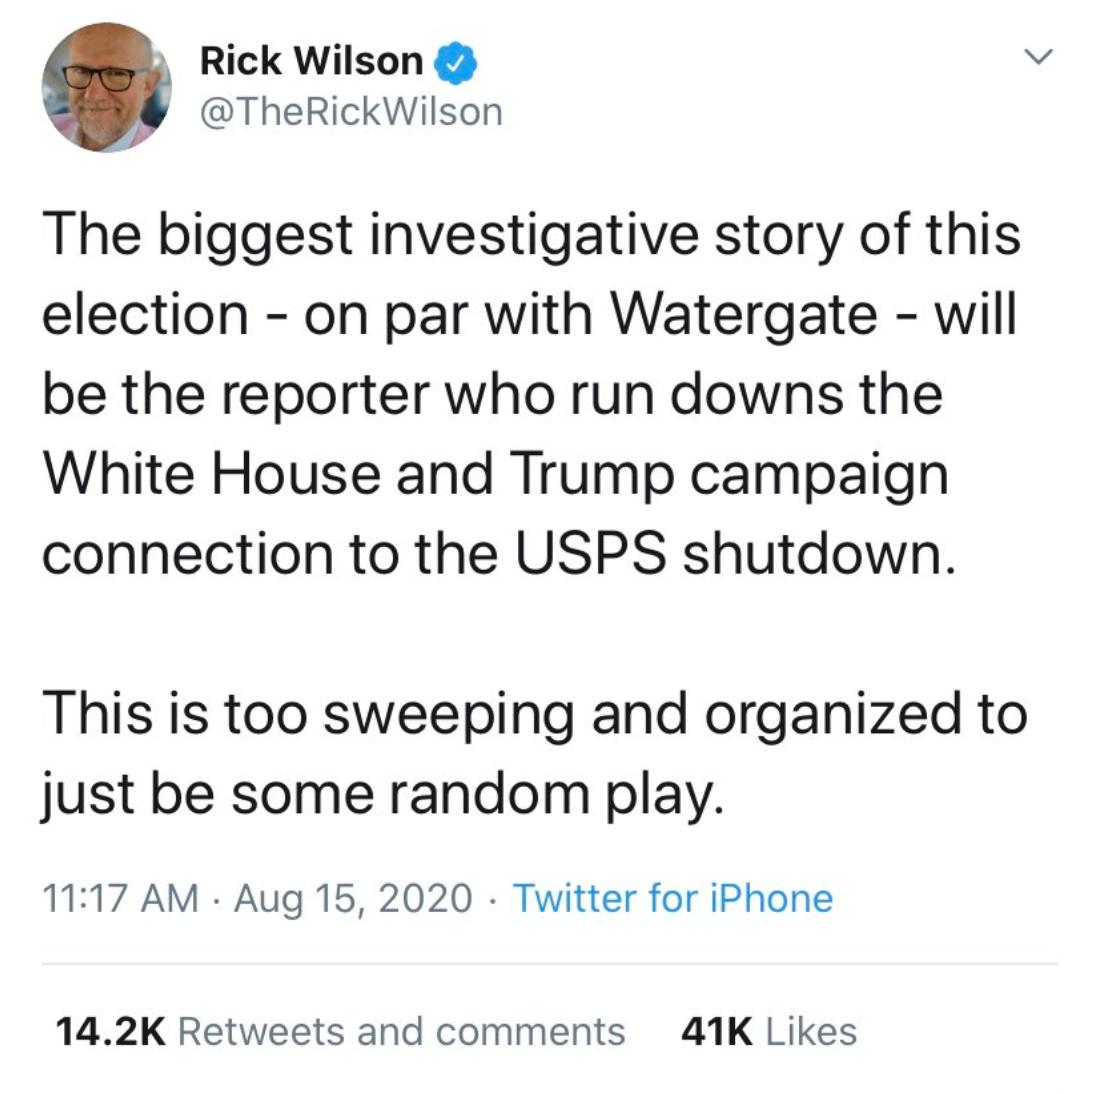 USPS conspiracy